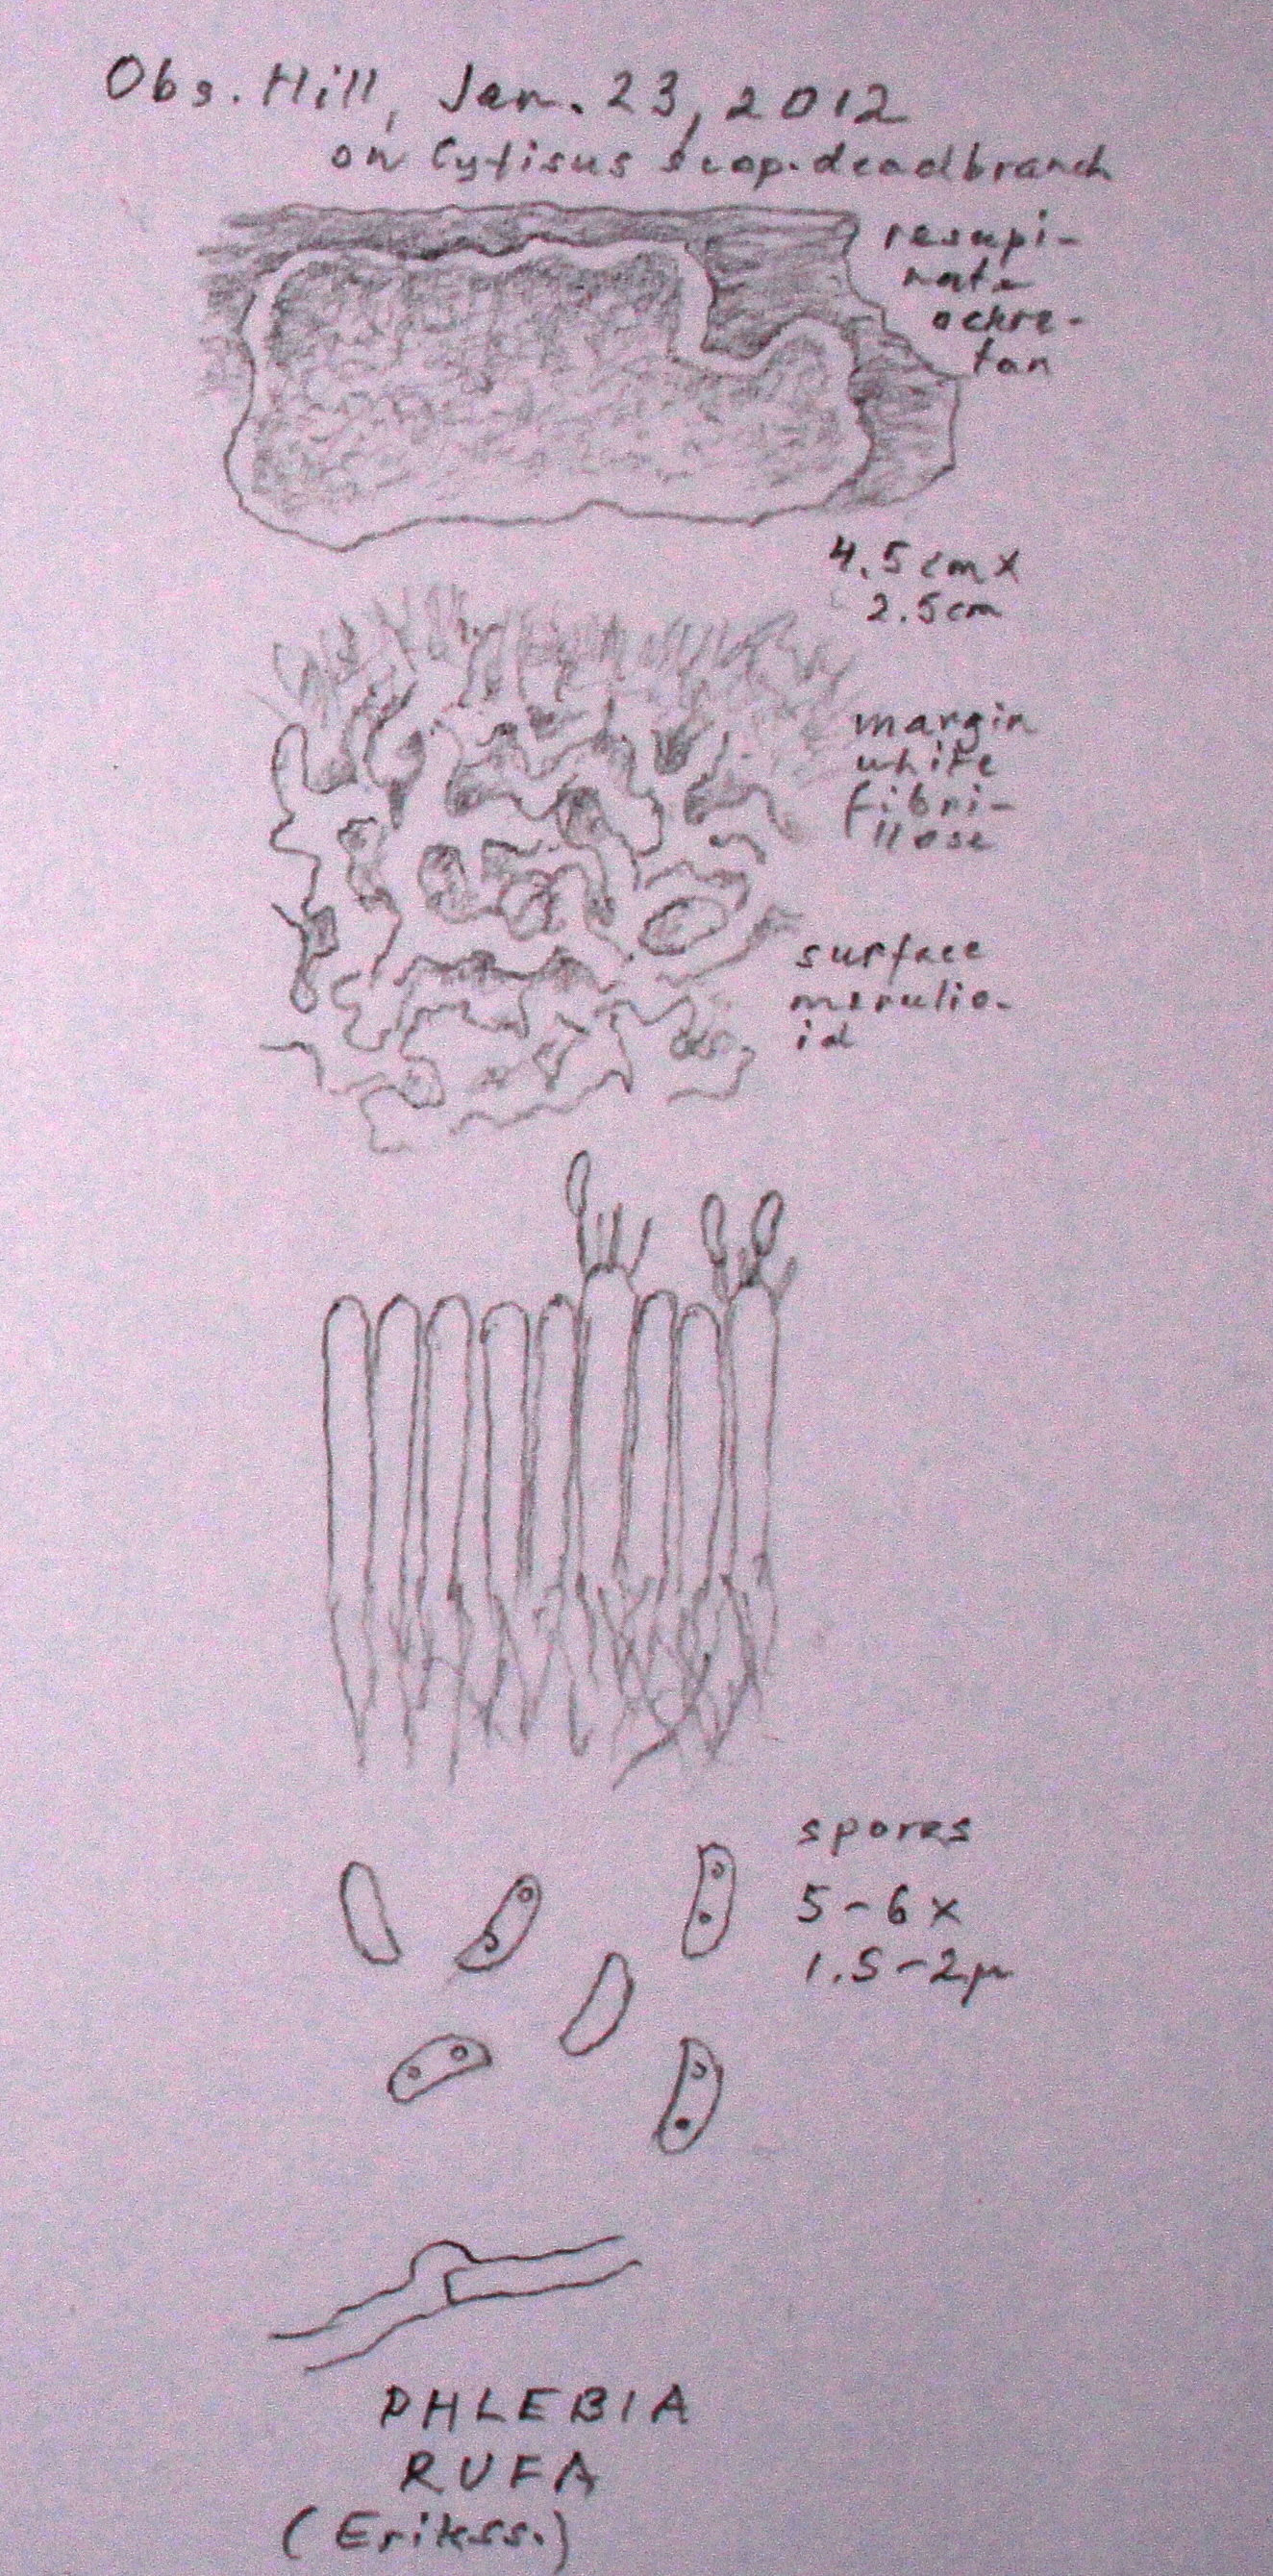 Phlebia rufa image